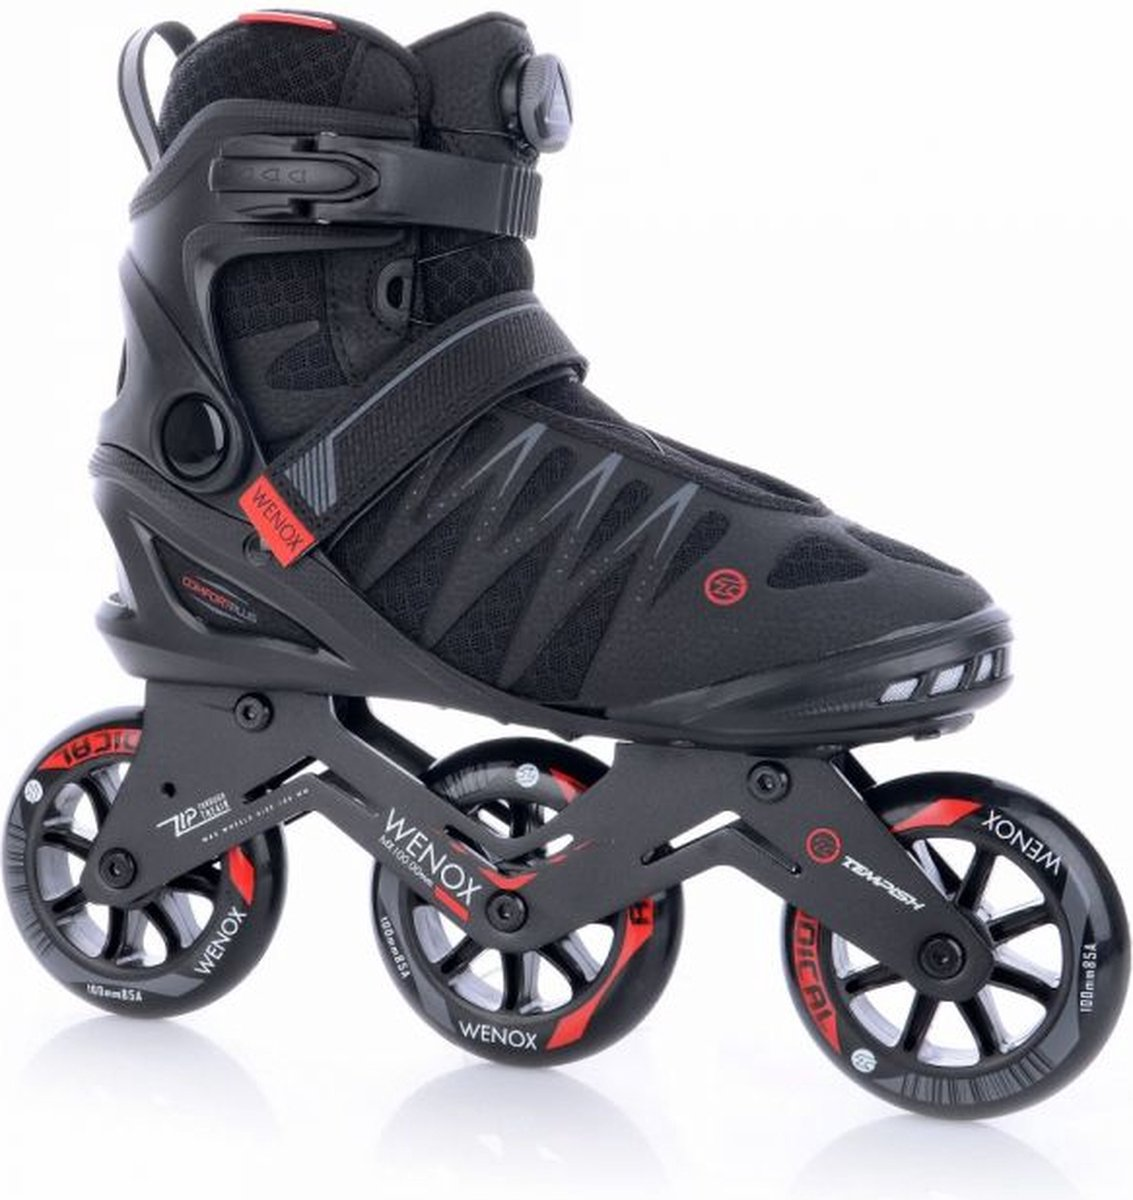 Tempish - Skeelers - Wenox - Top 100 - Zwart/Rood - Maat 45 - Heren - Skates